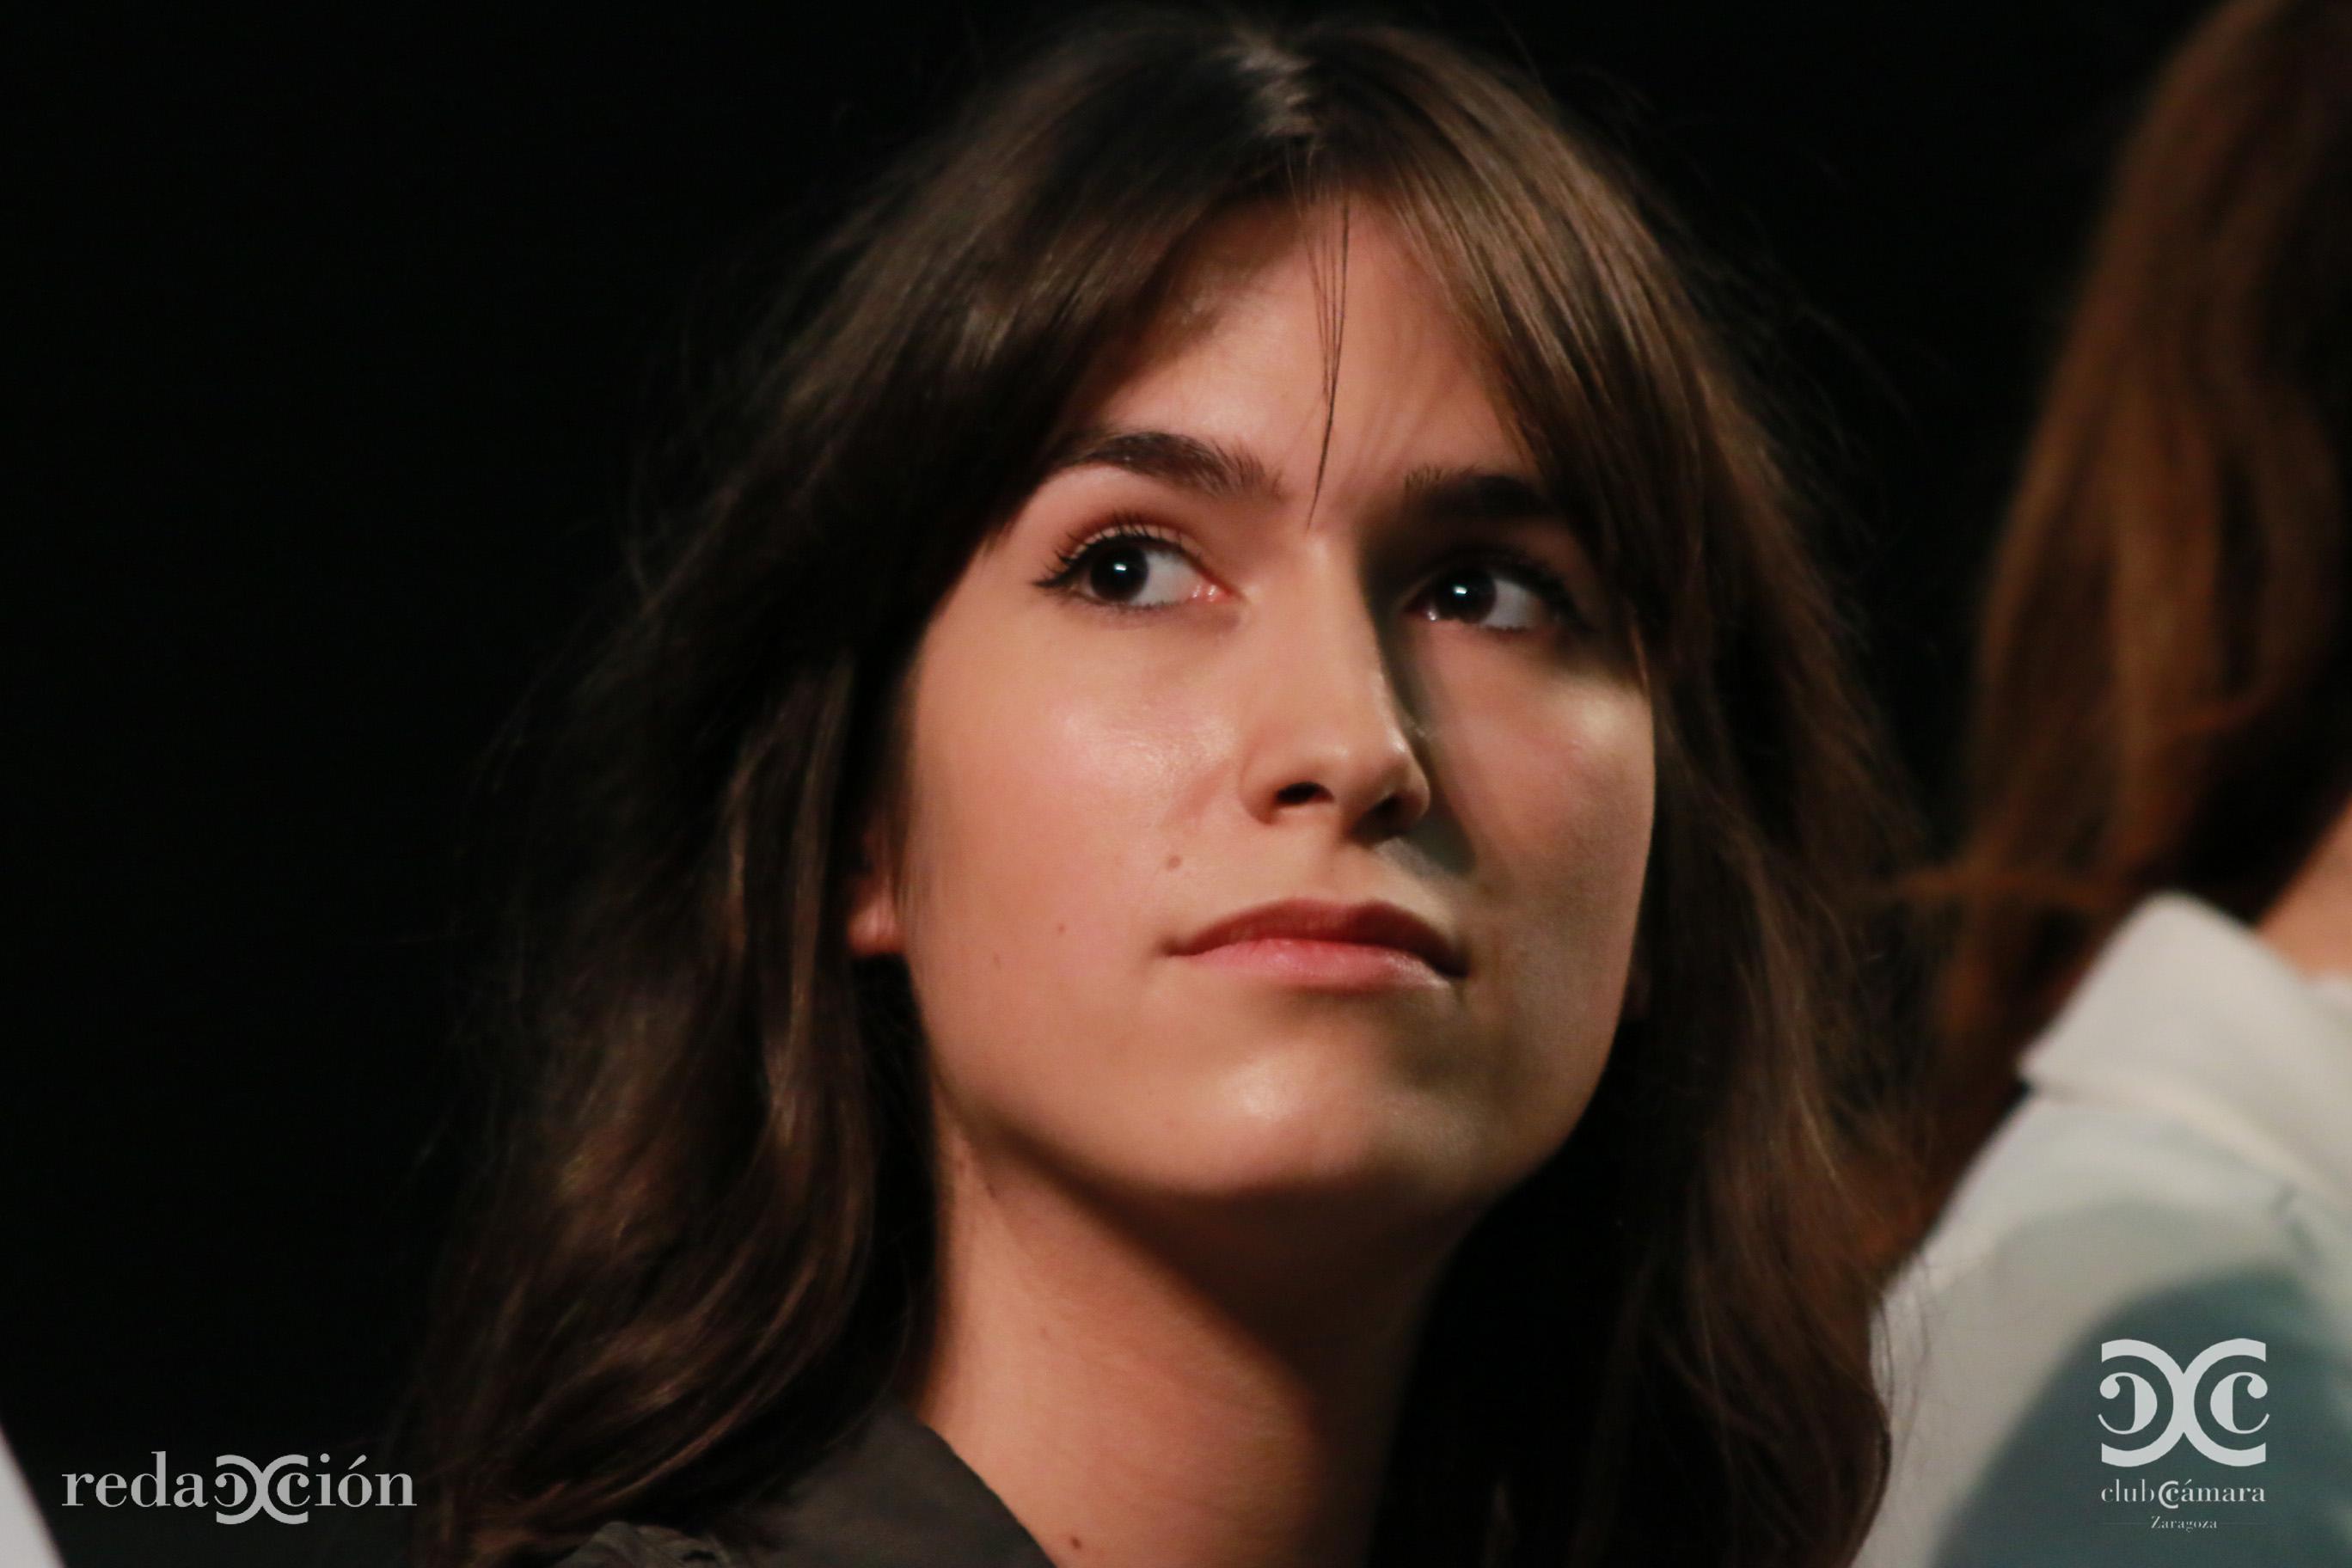 Ángela Ranedo